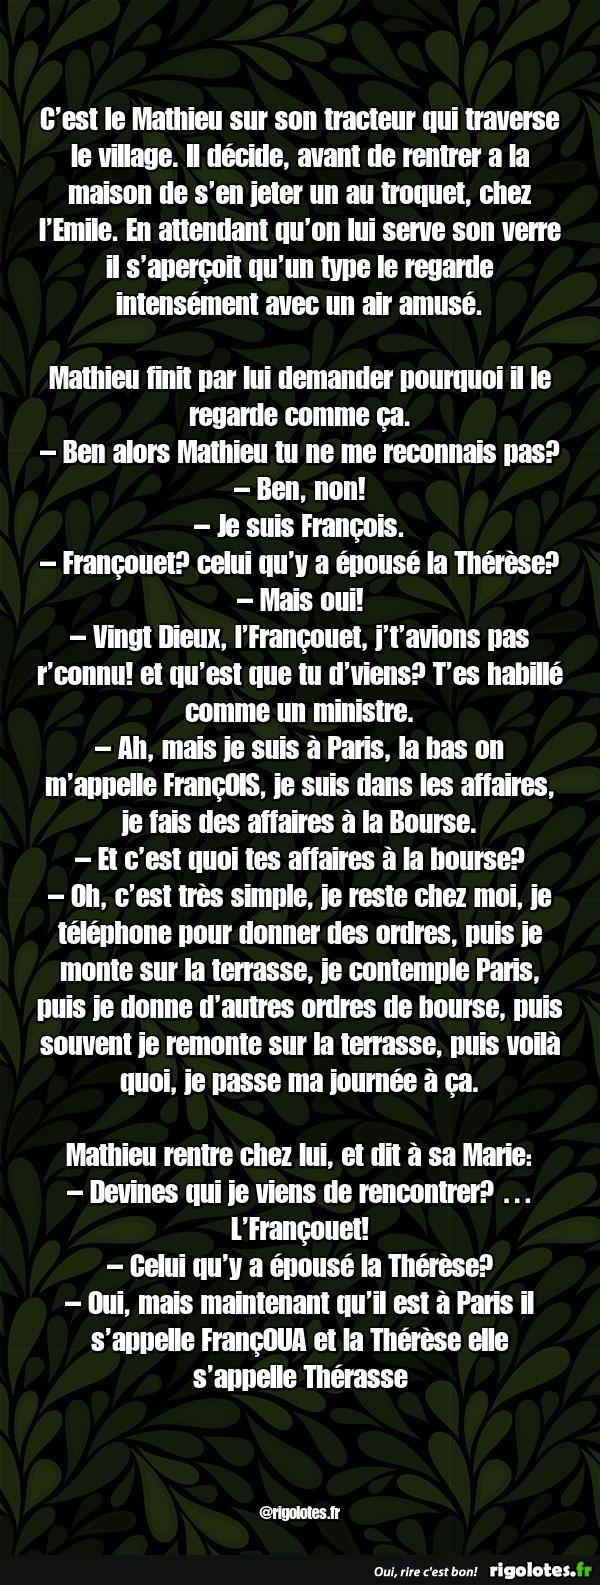 Photos Humour : appellation